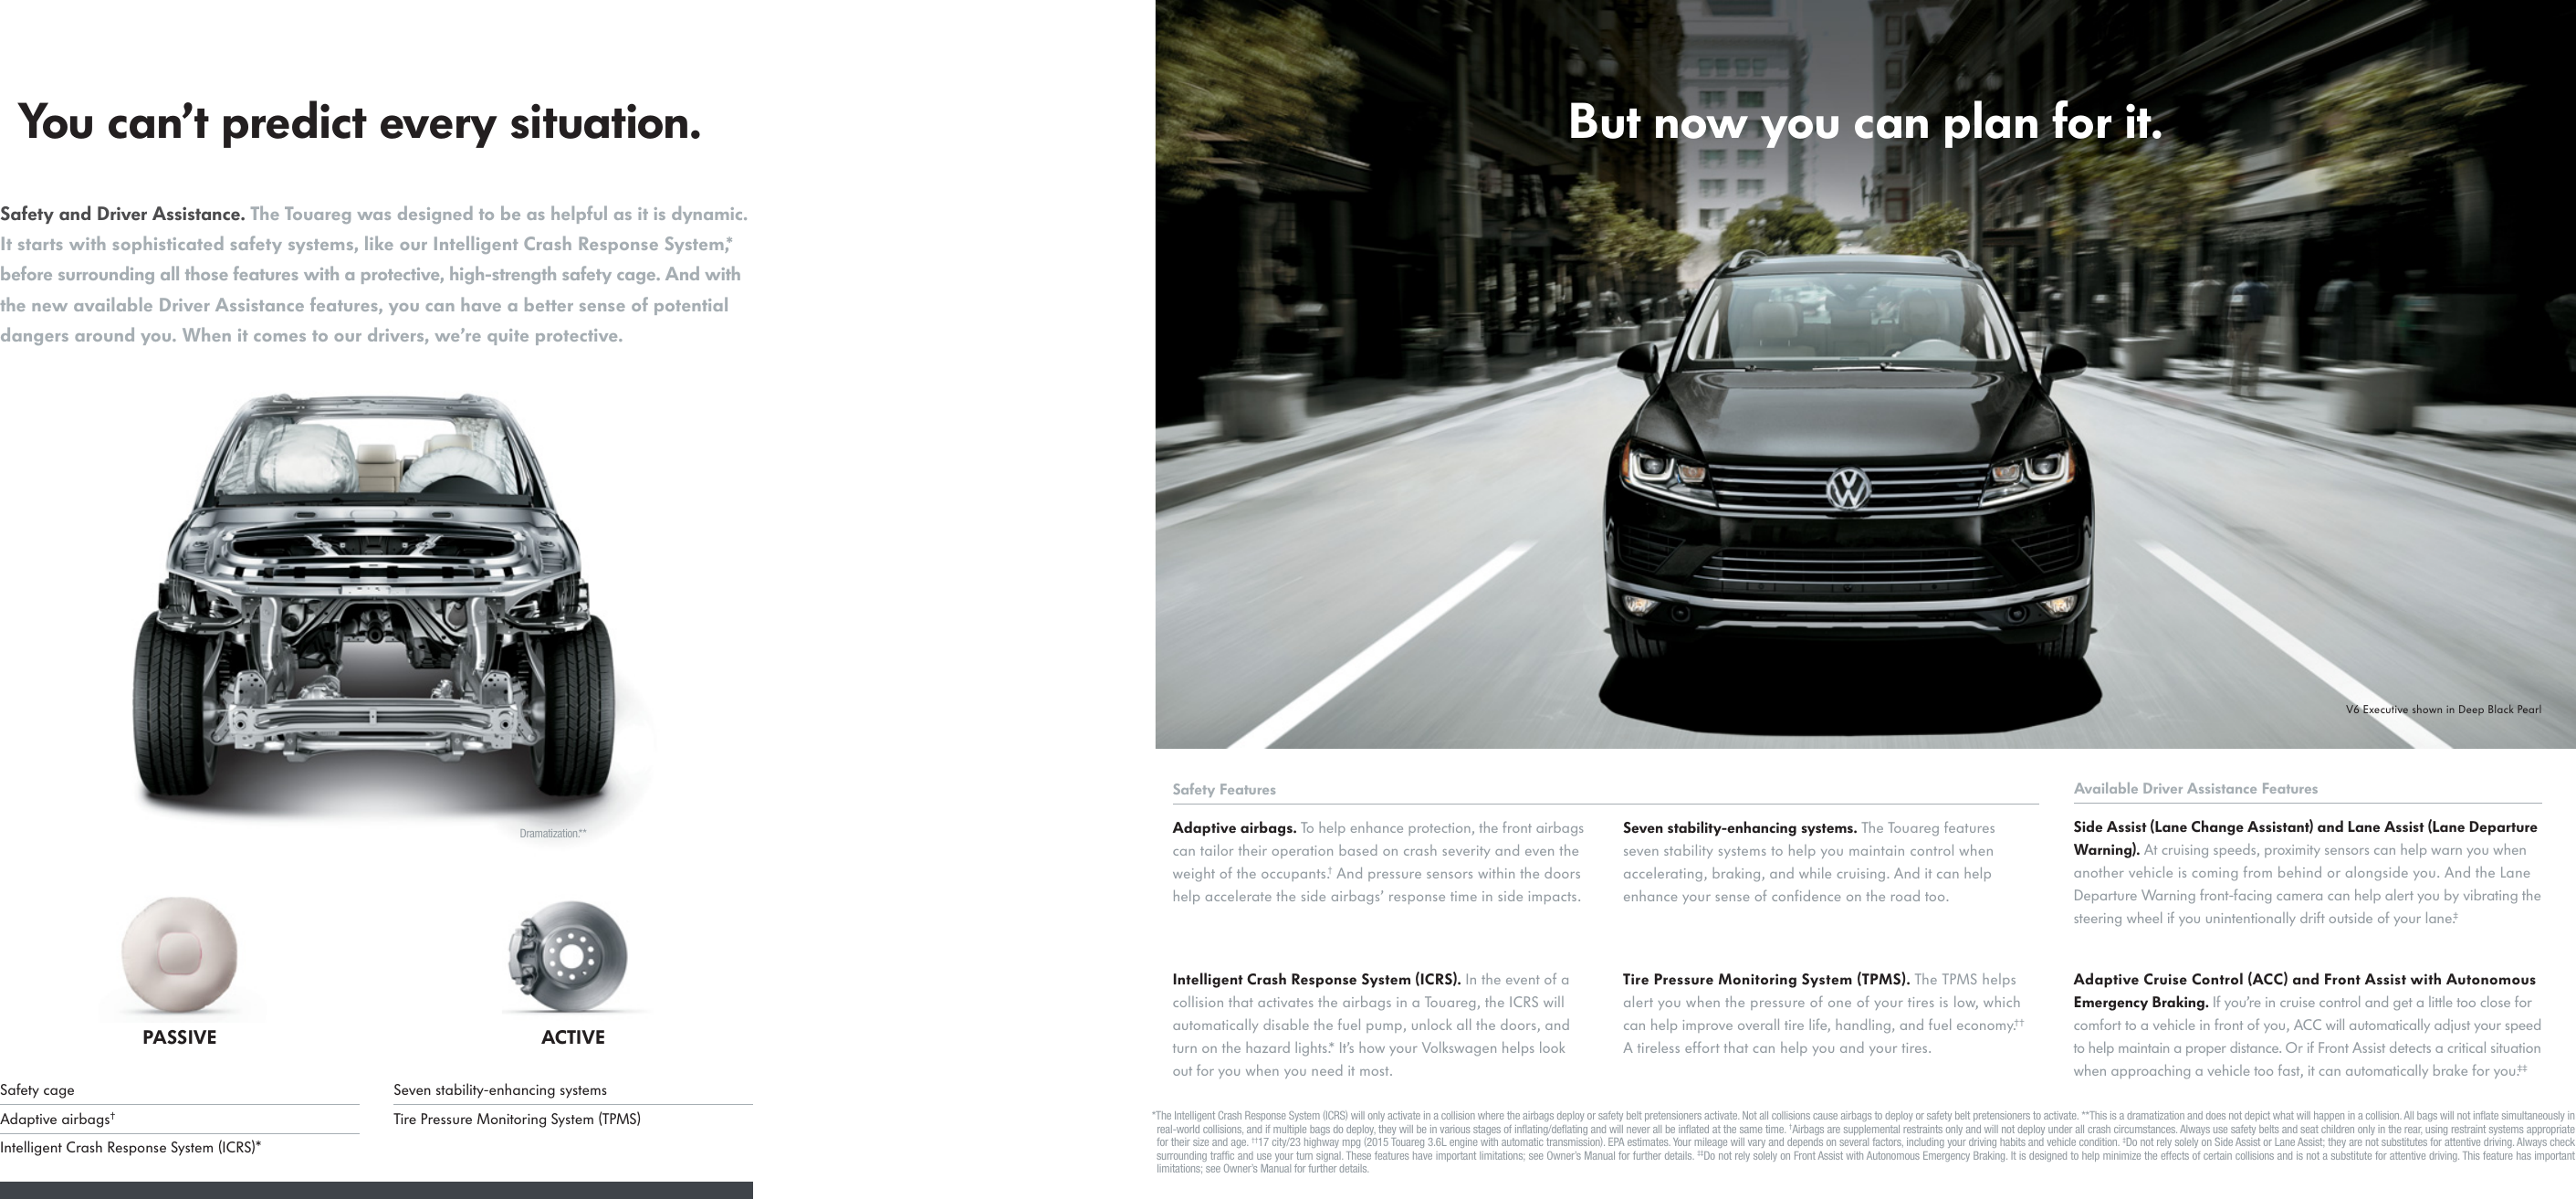 VWA 10185739_MY15_Touareg_Brochure_FC_BC_Singles 2015 Volkswagen